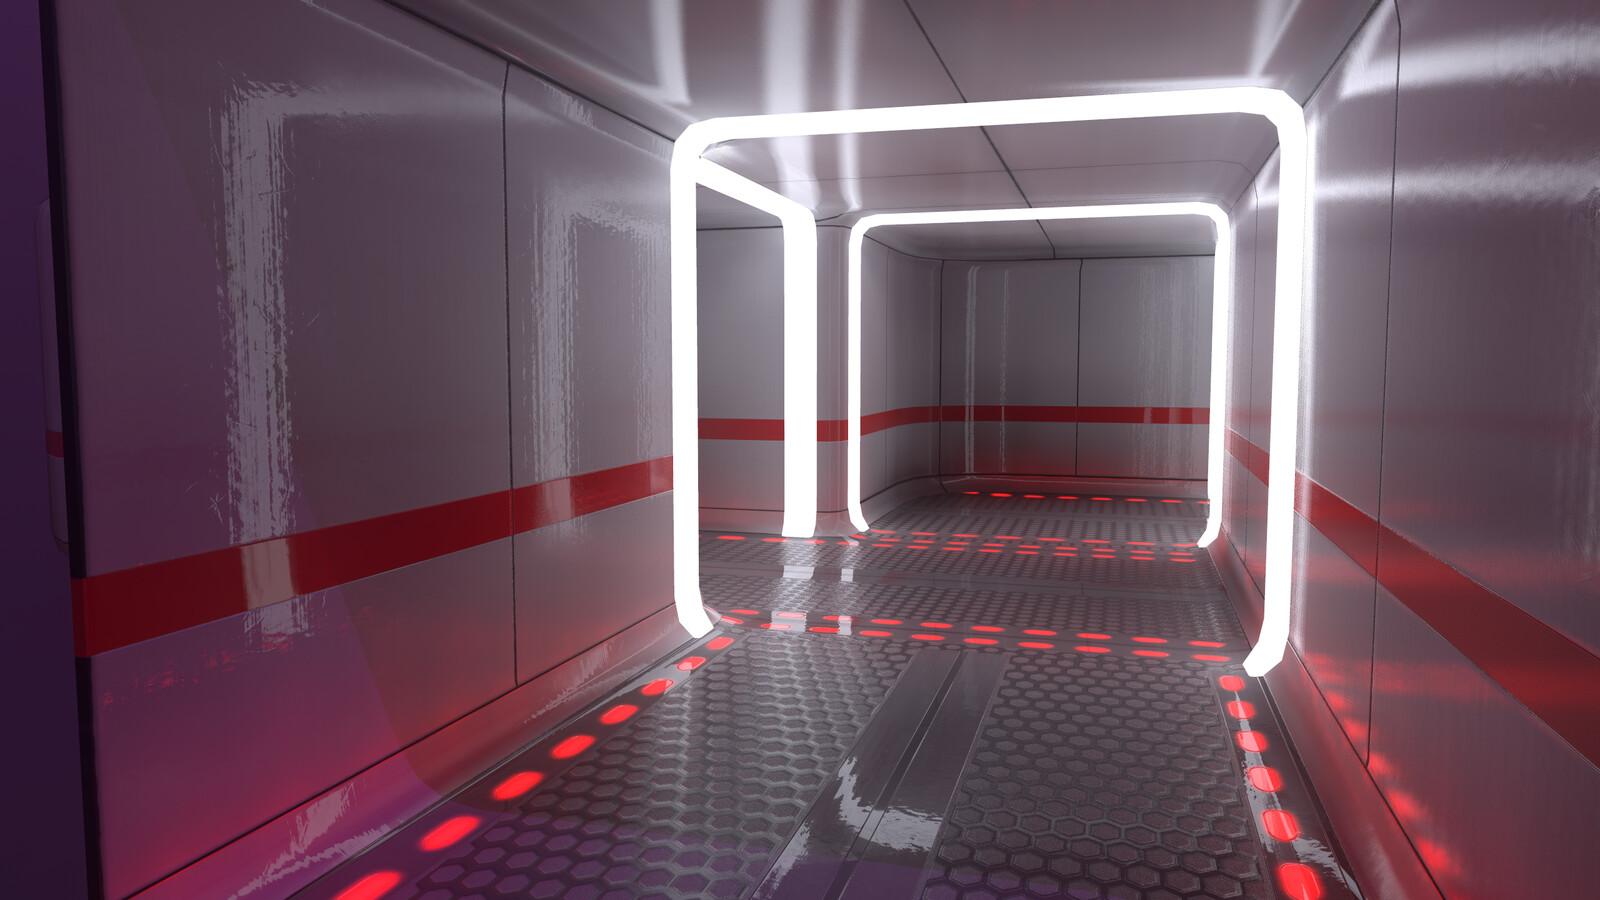 SciFi Hallway WIP